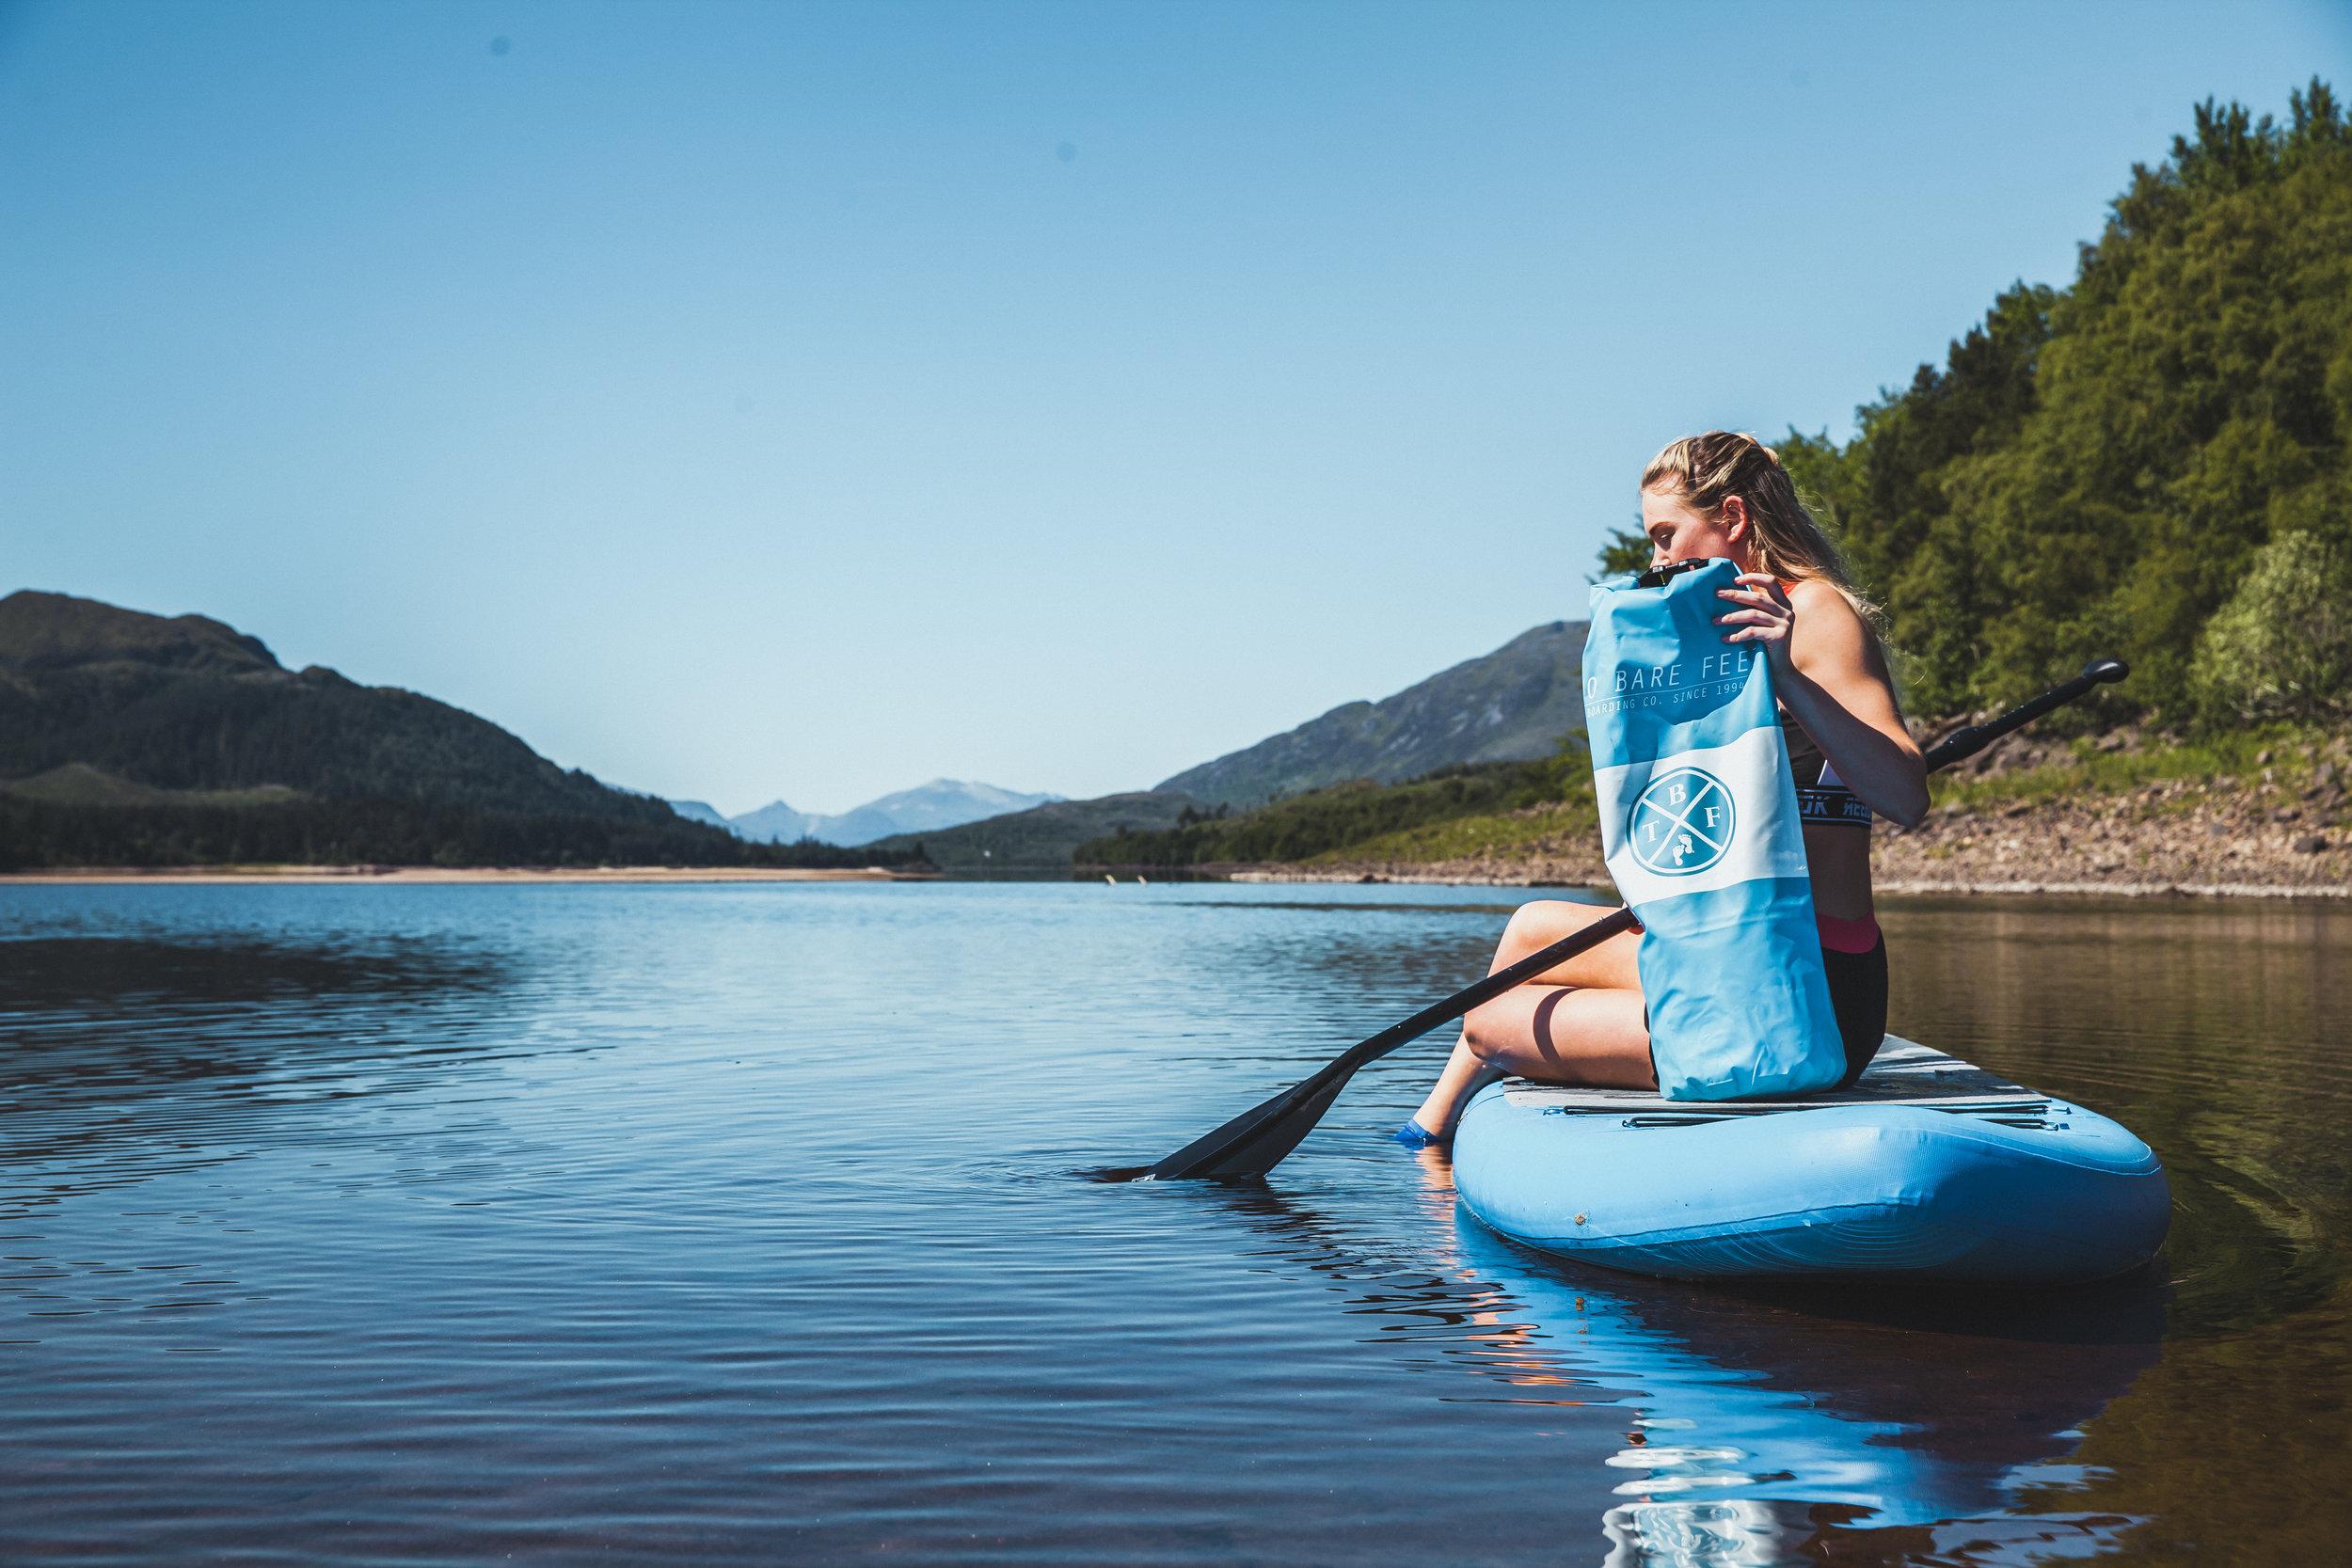 paddle-boarding-scotland-emily-hutton